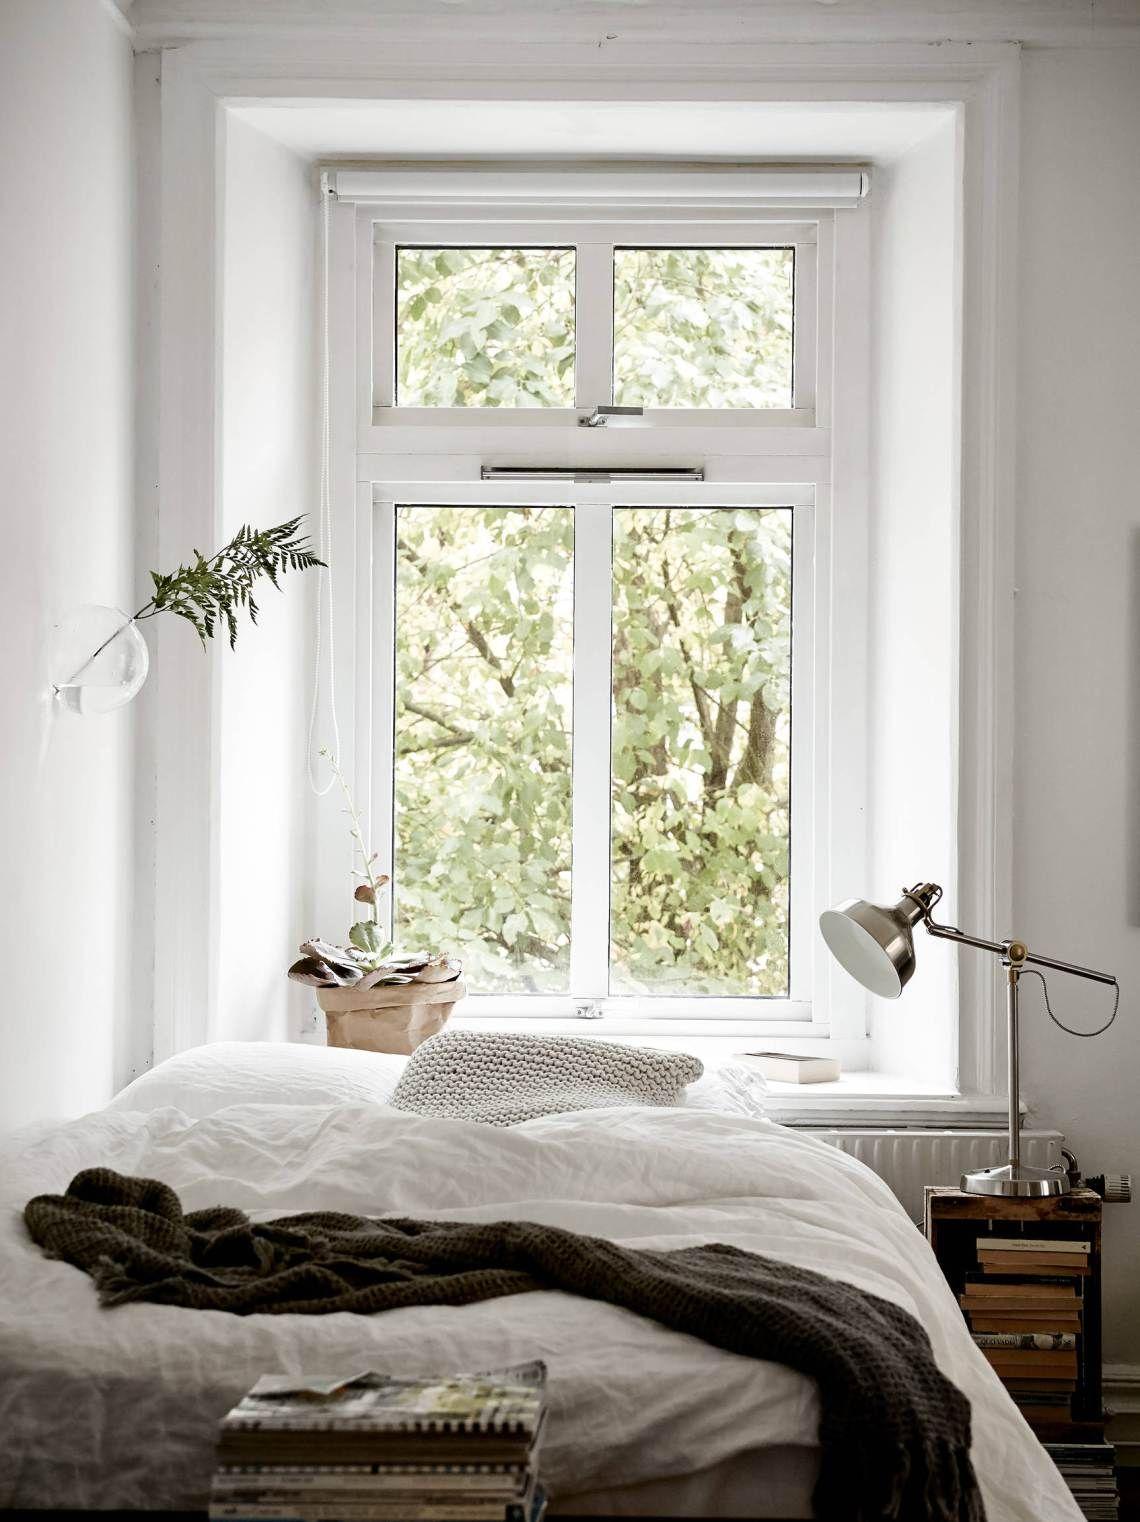 Cozy One Room Flat Coco Lapine Design Cozy Small Bedrooms One Room Flat Apartment Interior